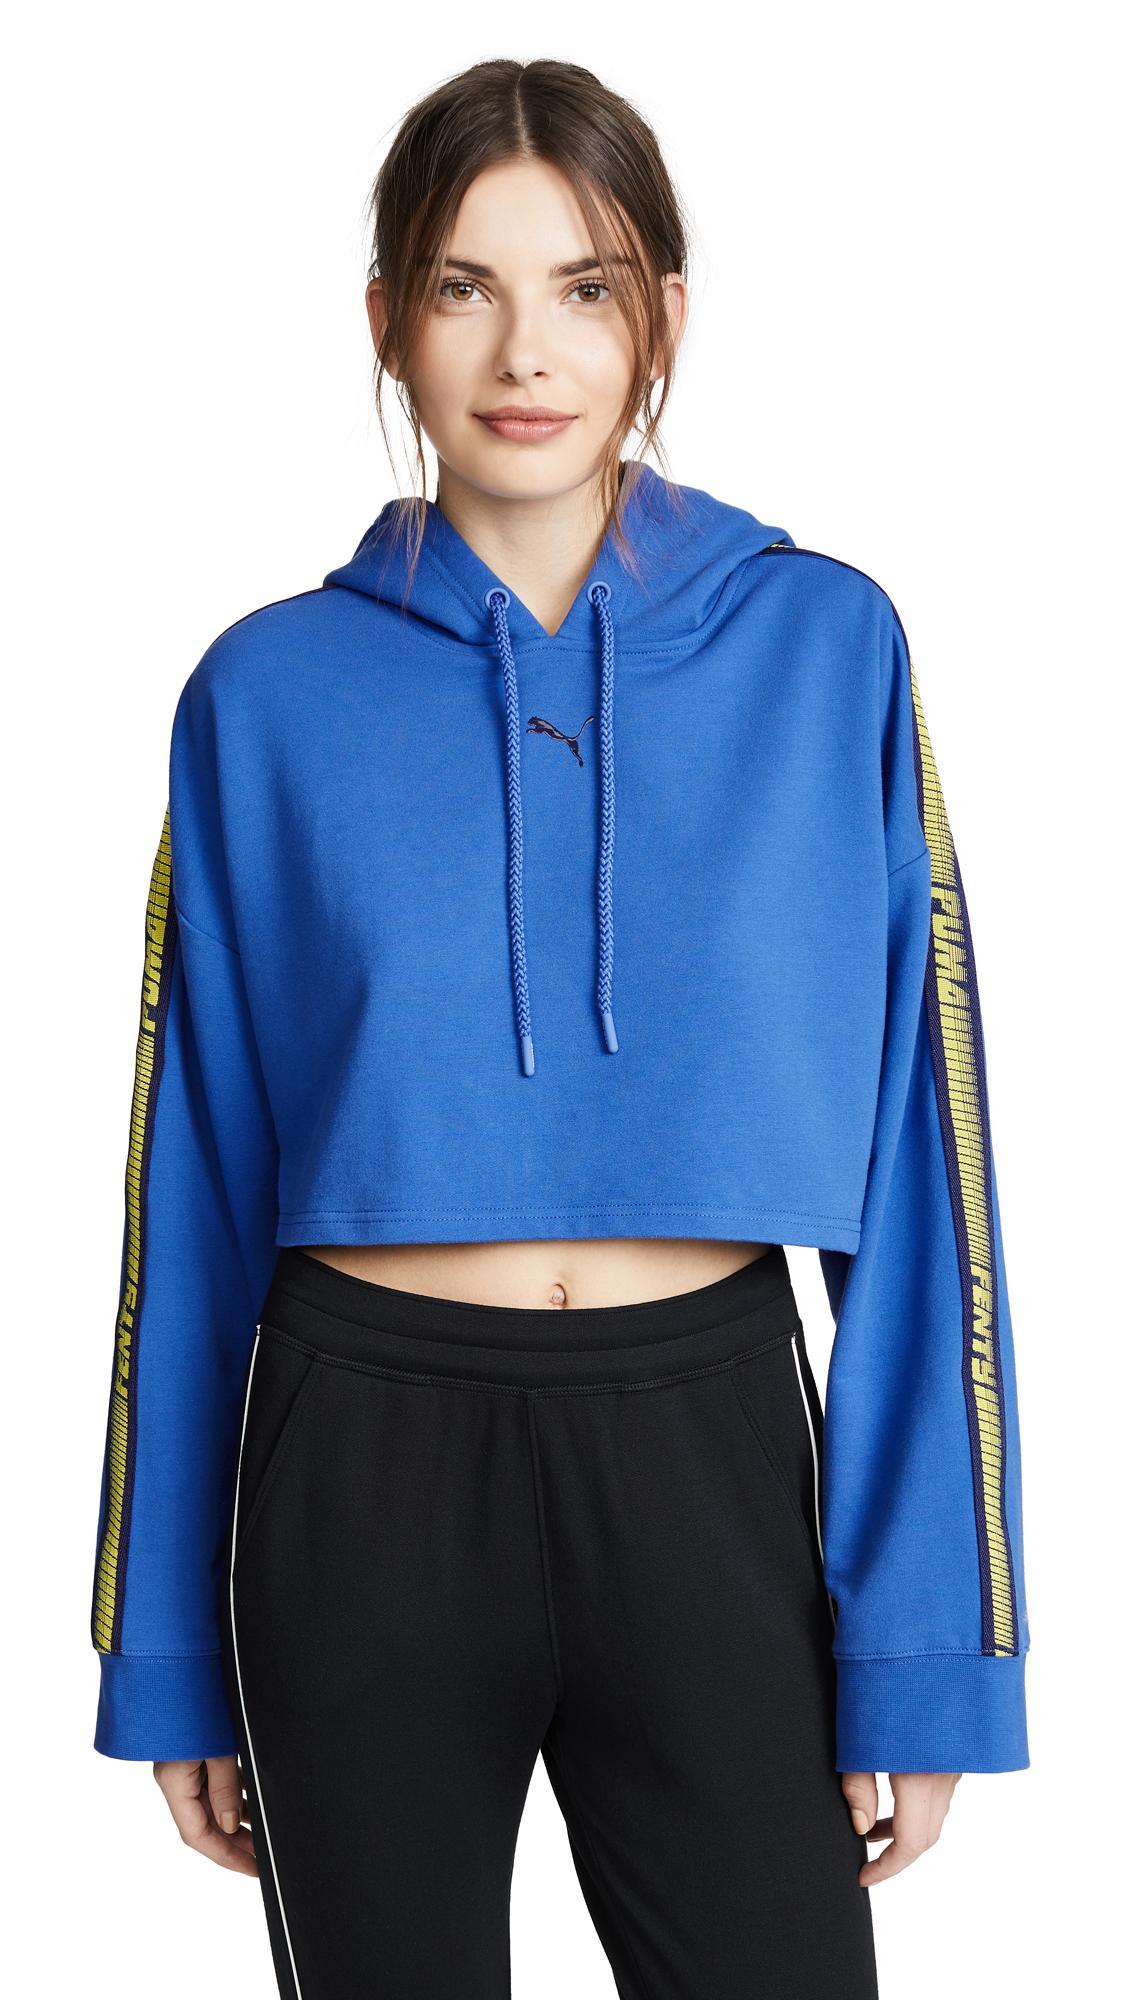 Puma Hooded Cropped Sweatshirt In Dazzling Blue